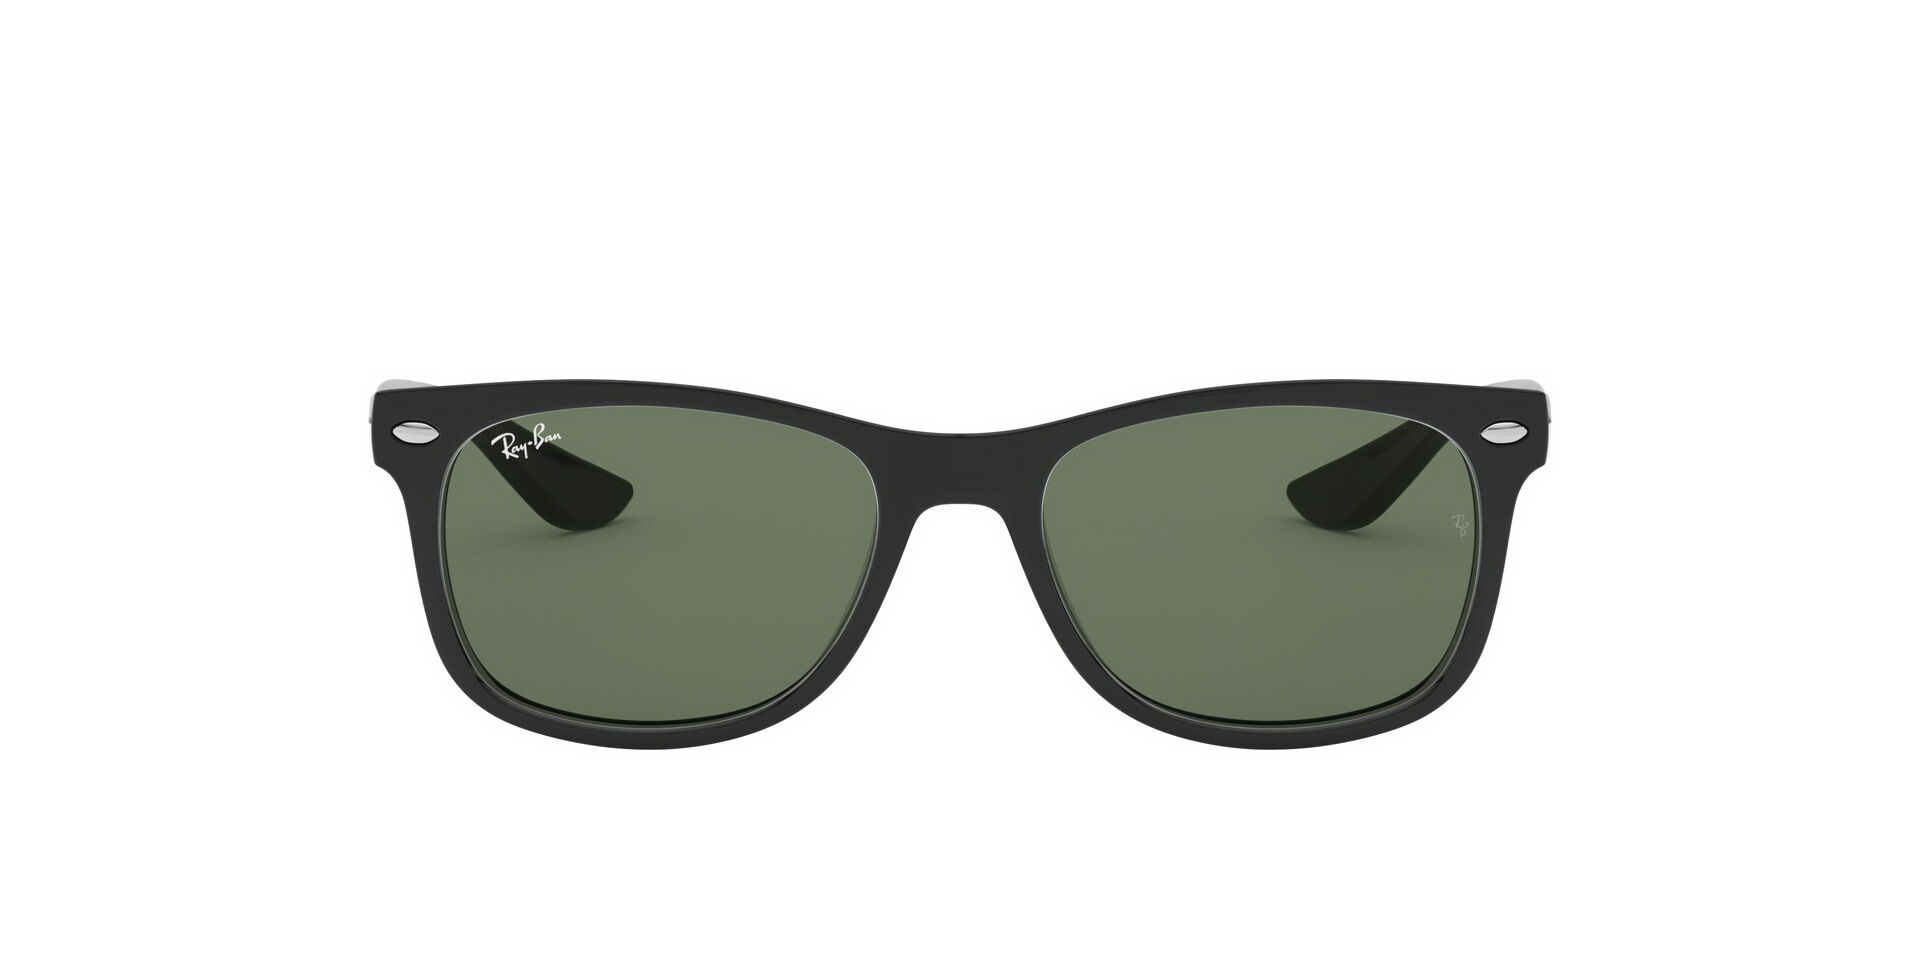 Солнцезащитные очки Очки с/з Ray Ban 0RJ9052S 100/71